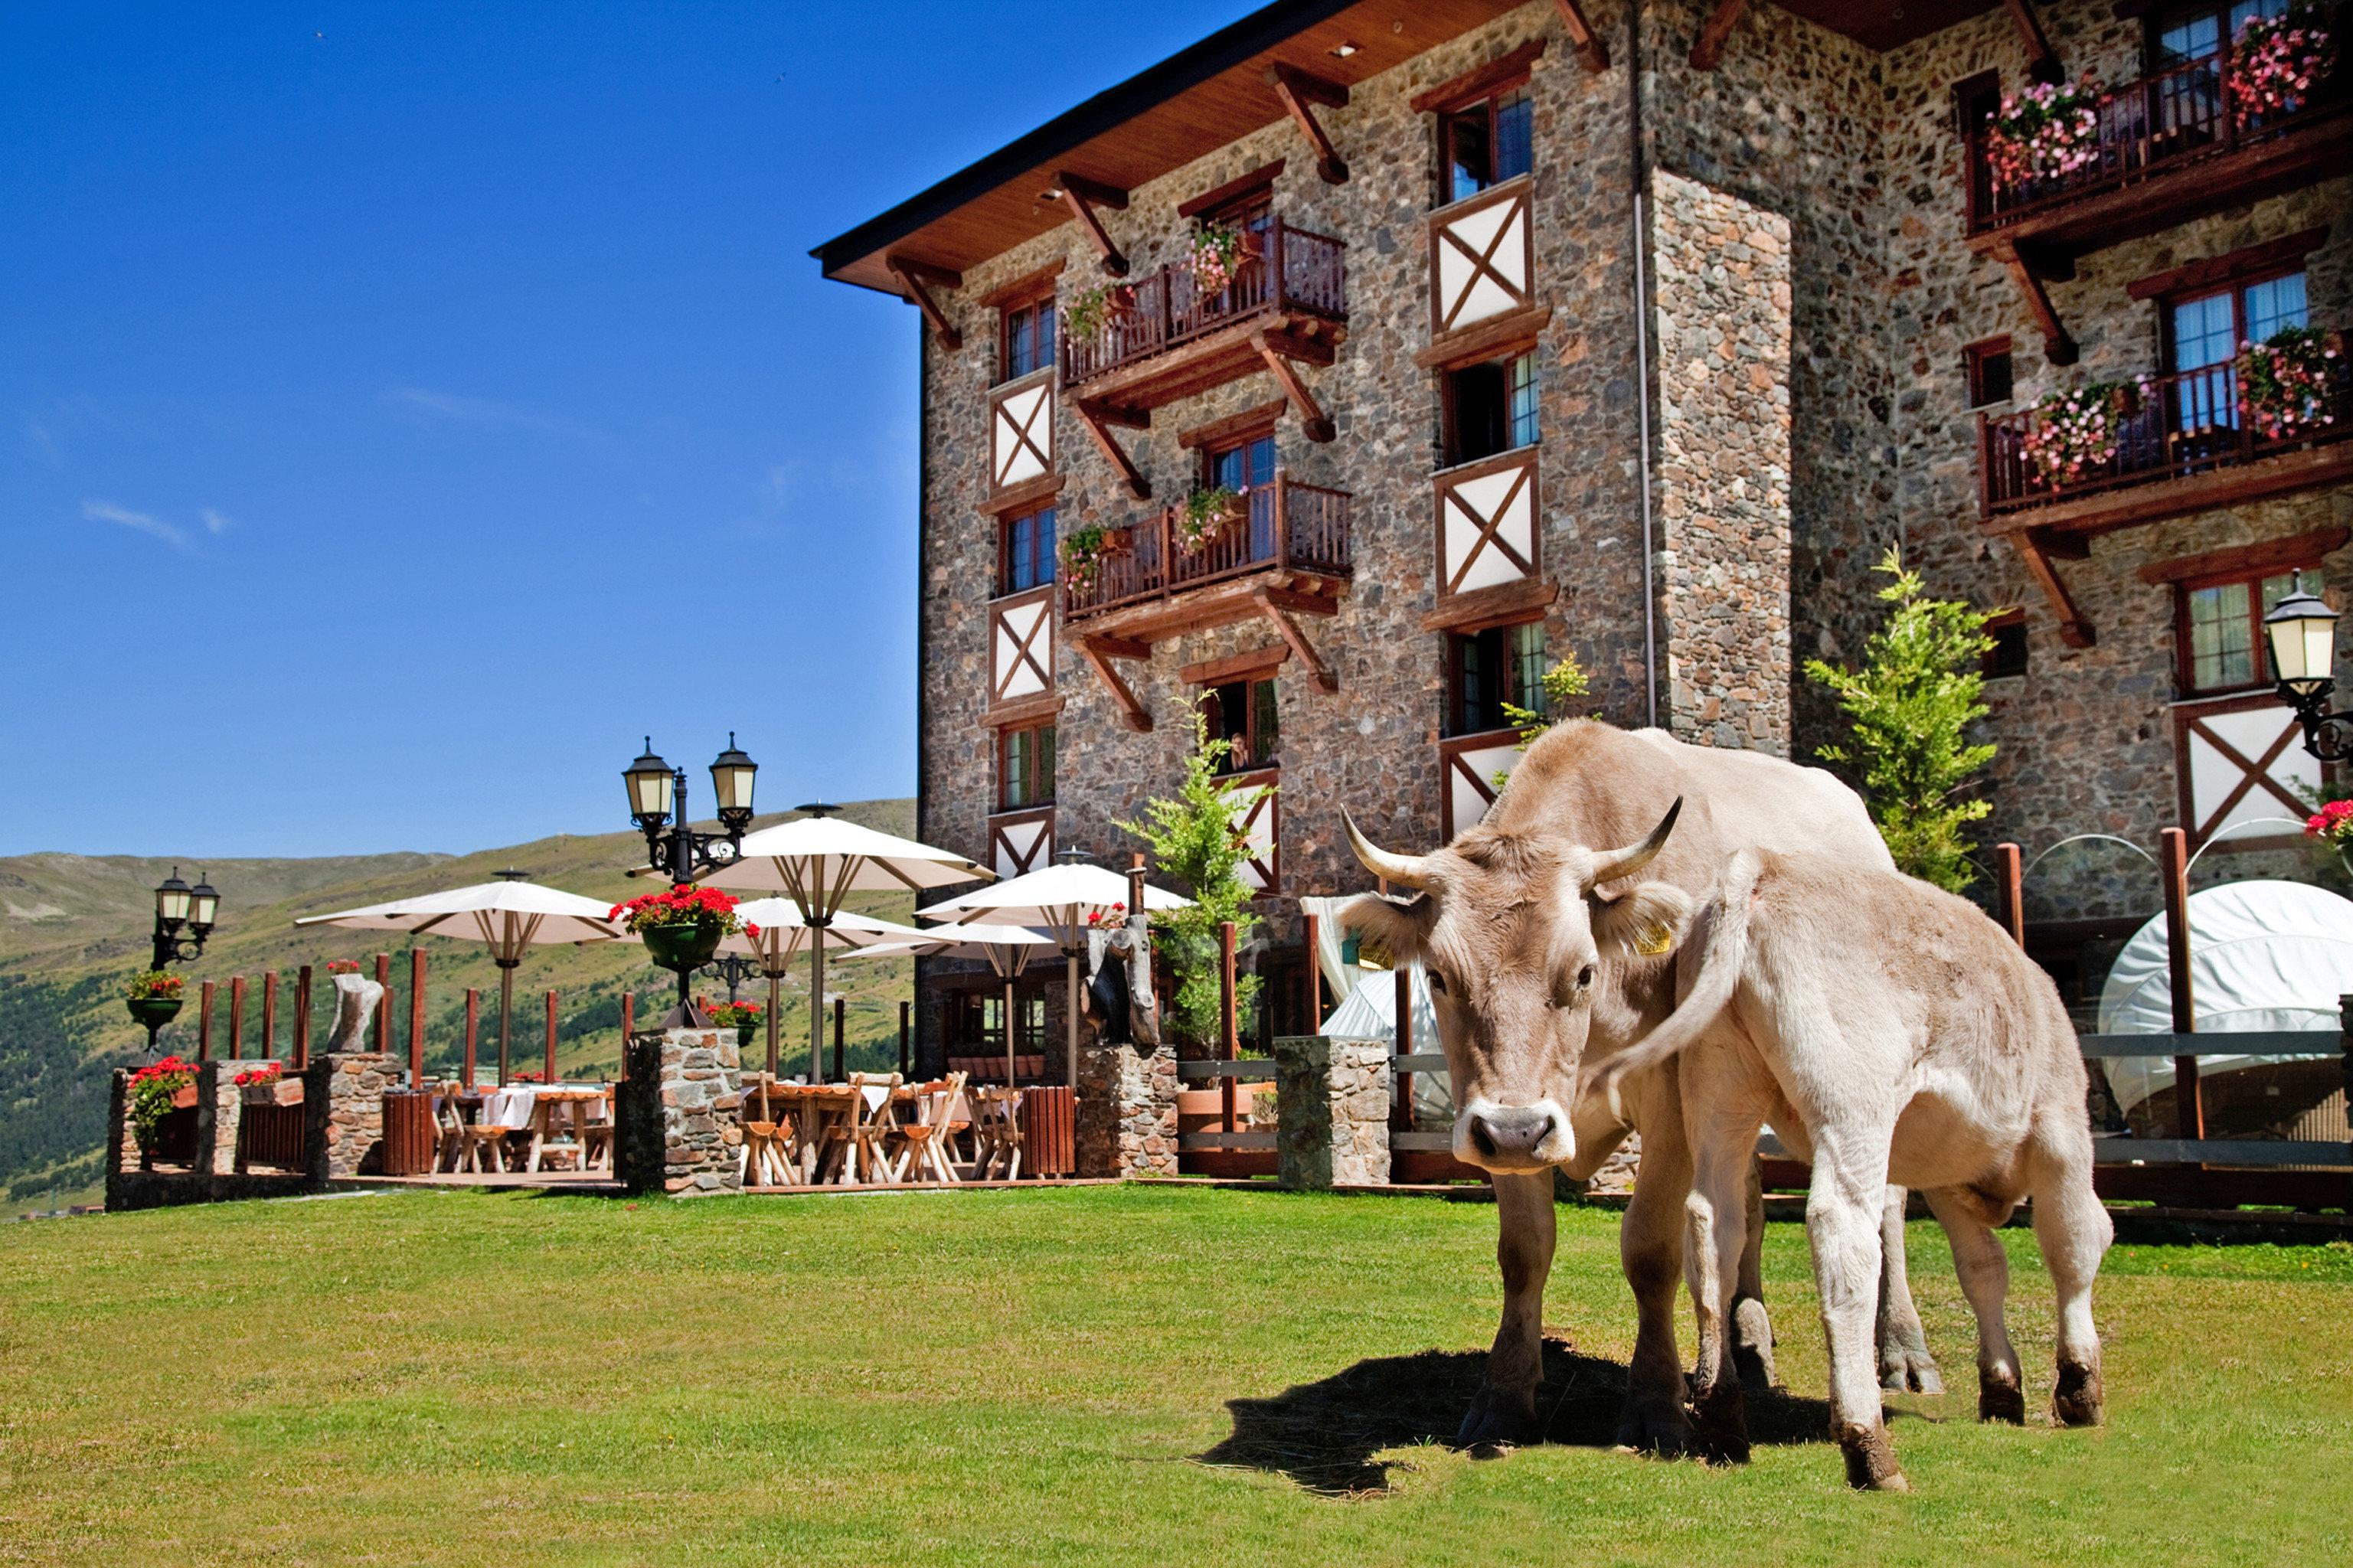 Adventure Exterior Grounds Lodge Resort Rustic grass horse mammal rural area horse like mammal Farm